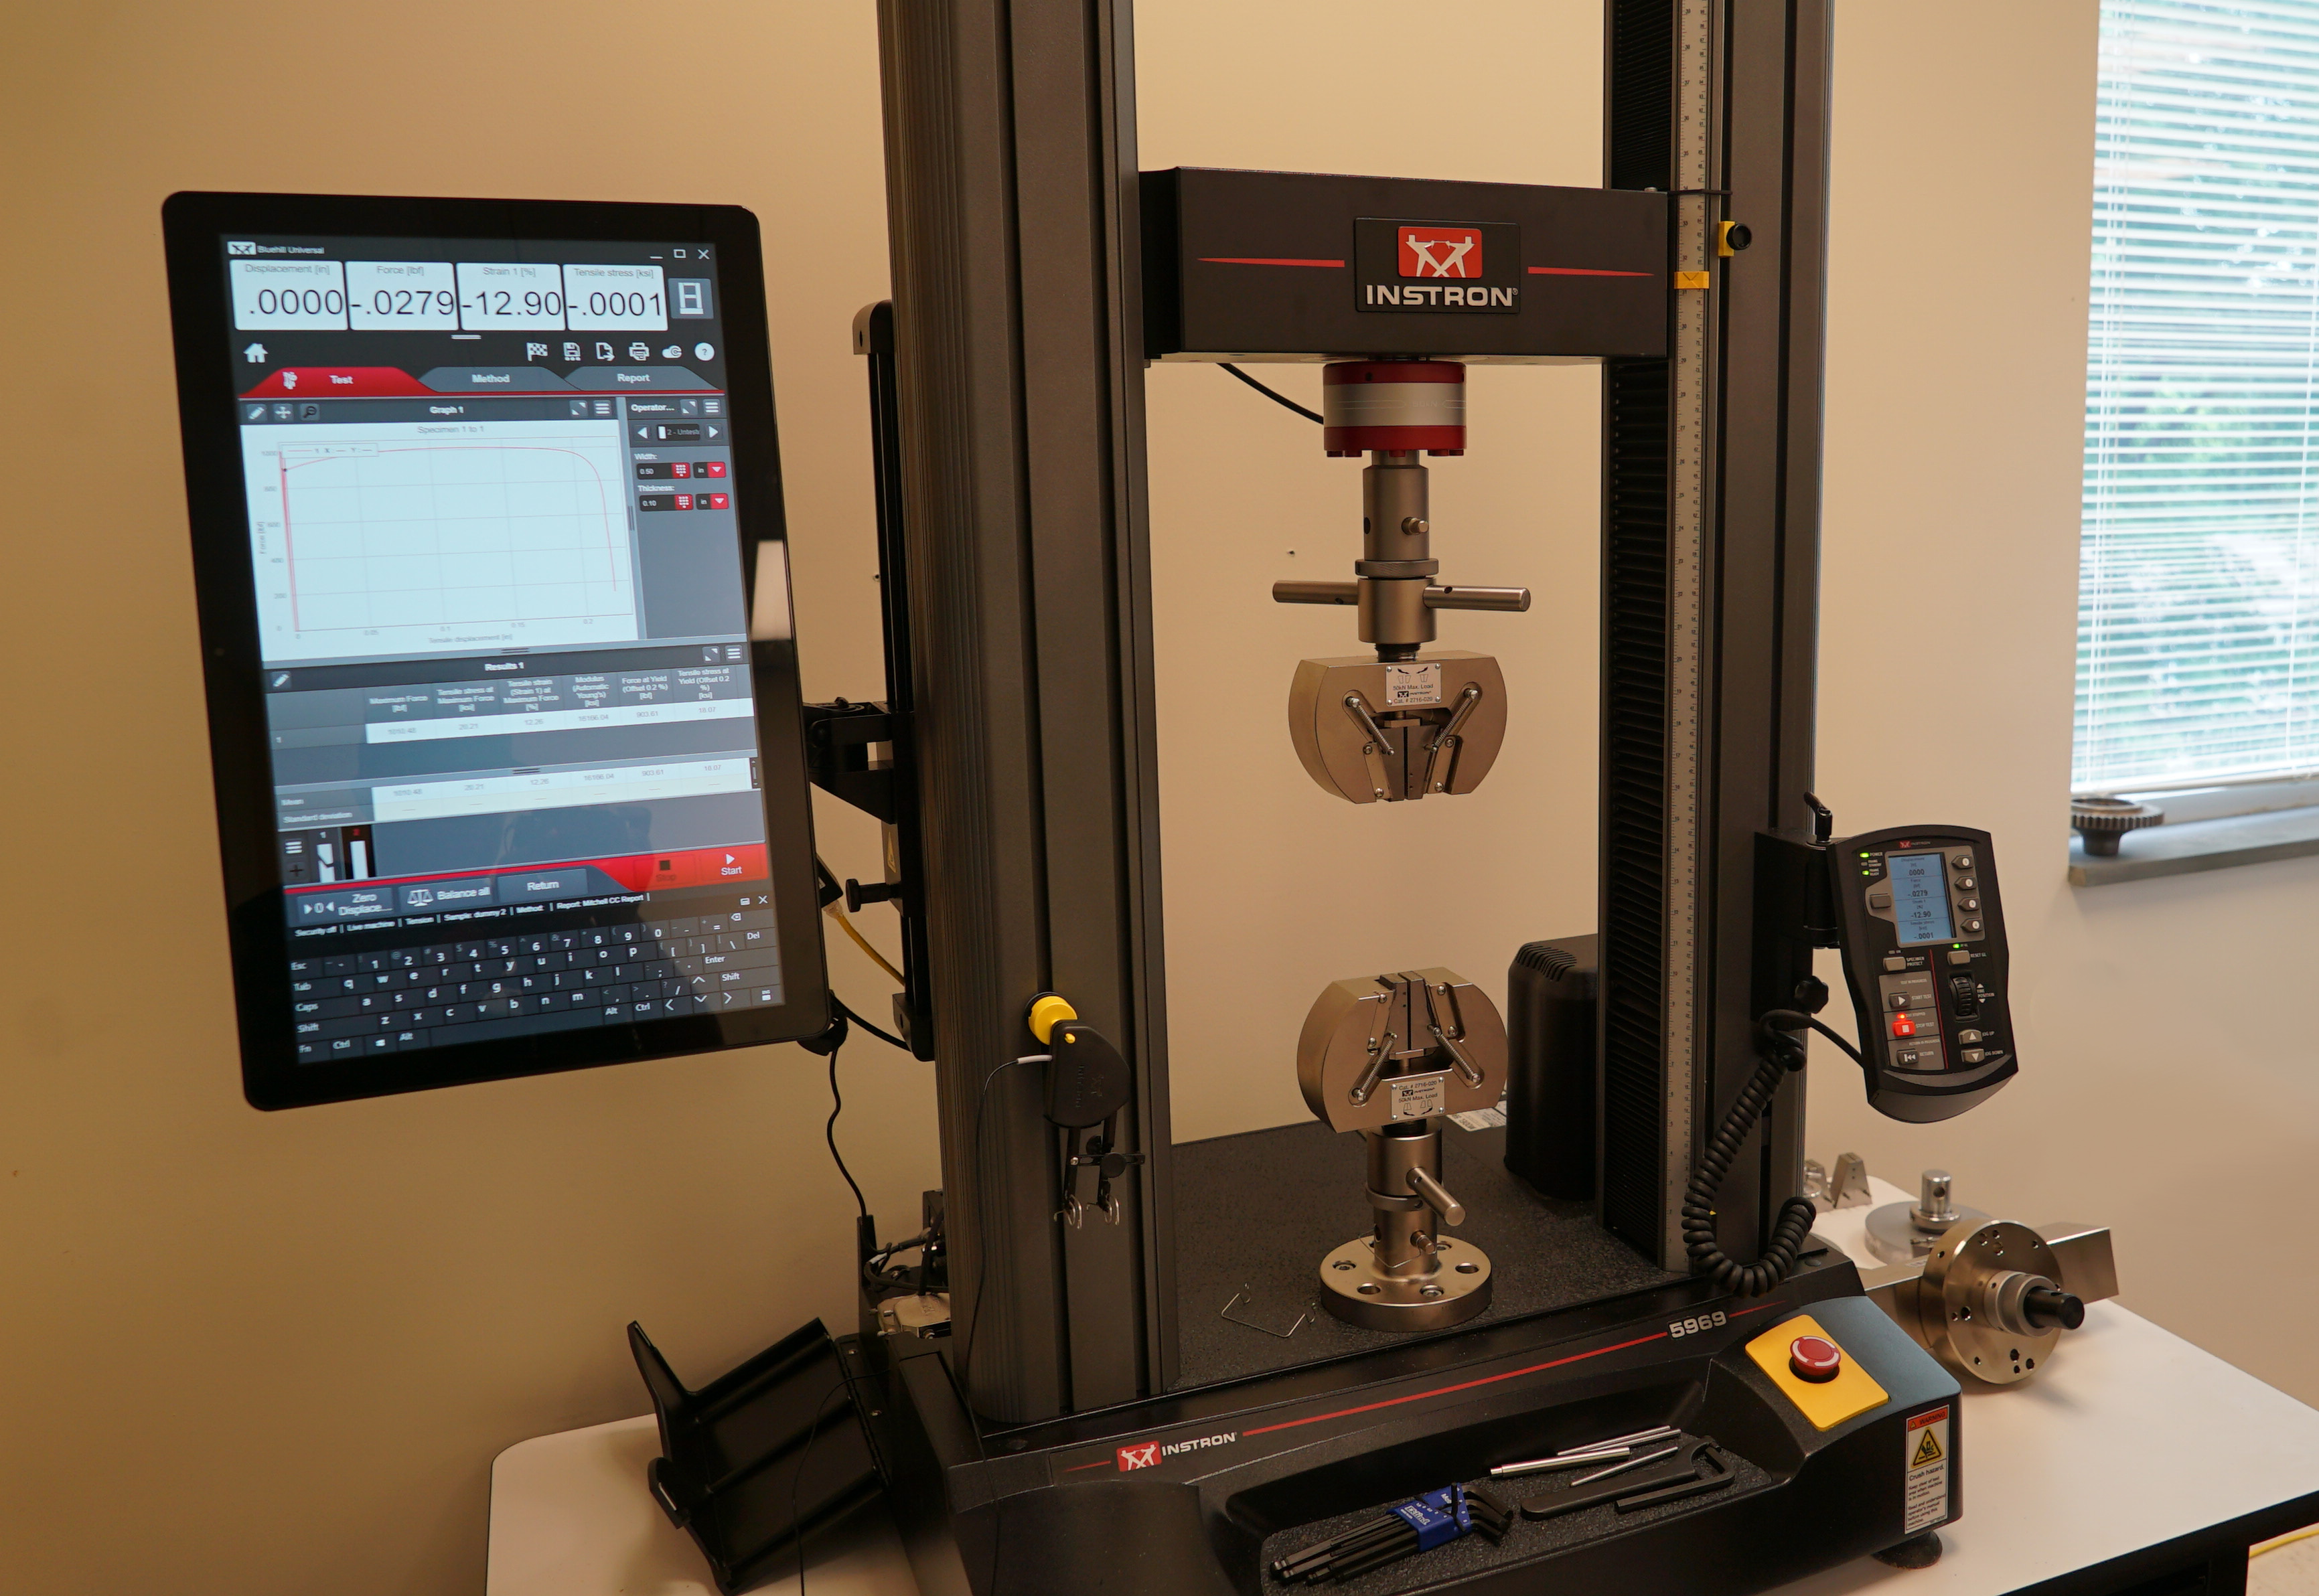 The Instron Universal Testing Machine